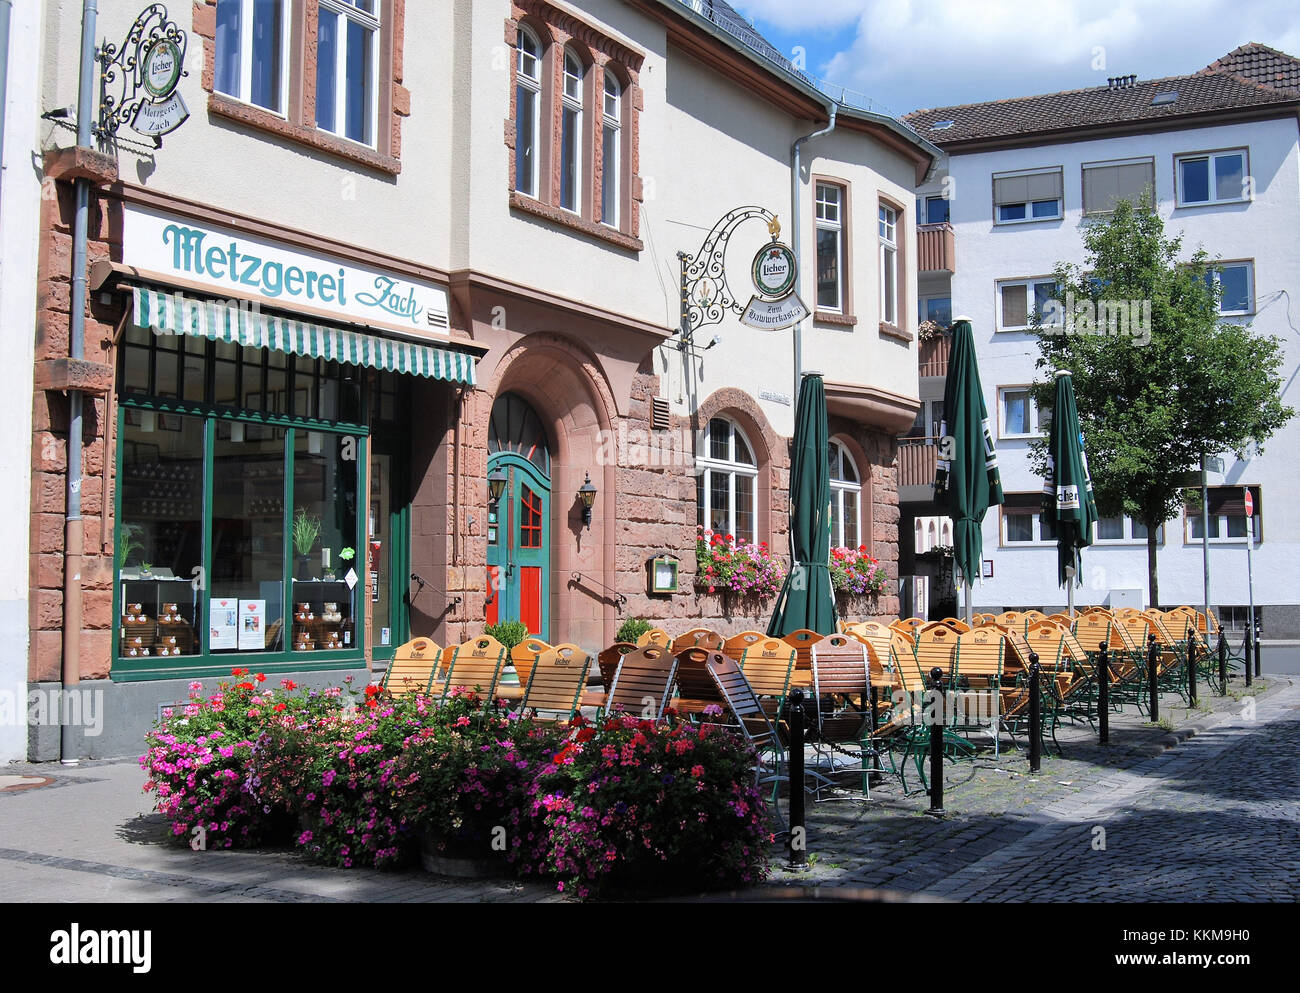 Butcher's shop Zach and earthy pub 'Zum Hawwerkasten' near the new castle in Giessen at a summer day - Stock Image